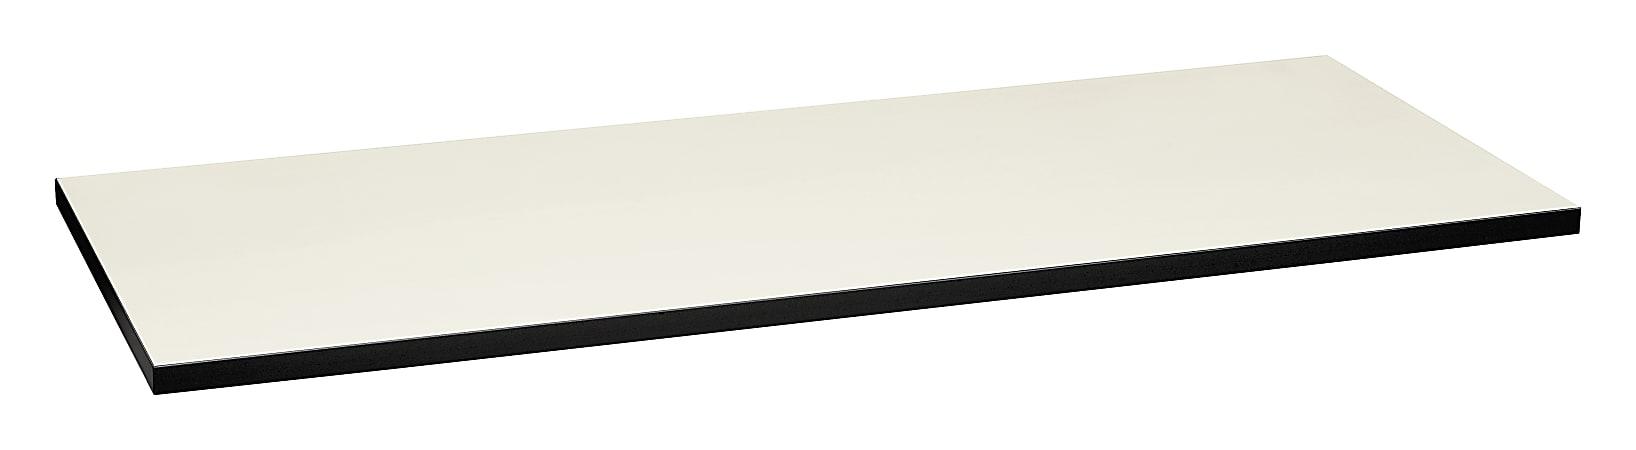 "HON Huddles Series™ Multipurpose Table Top, 60""W x 24""D, Silver/Black"